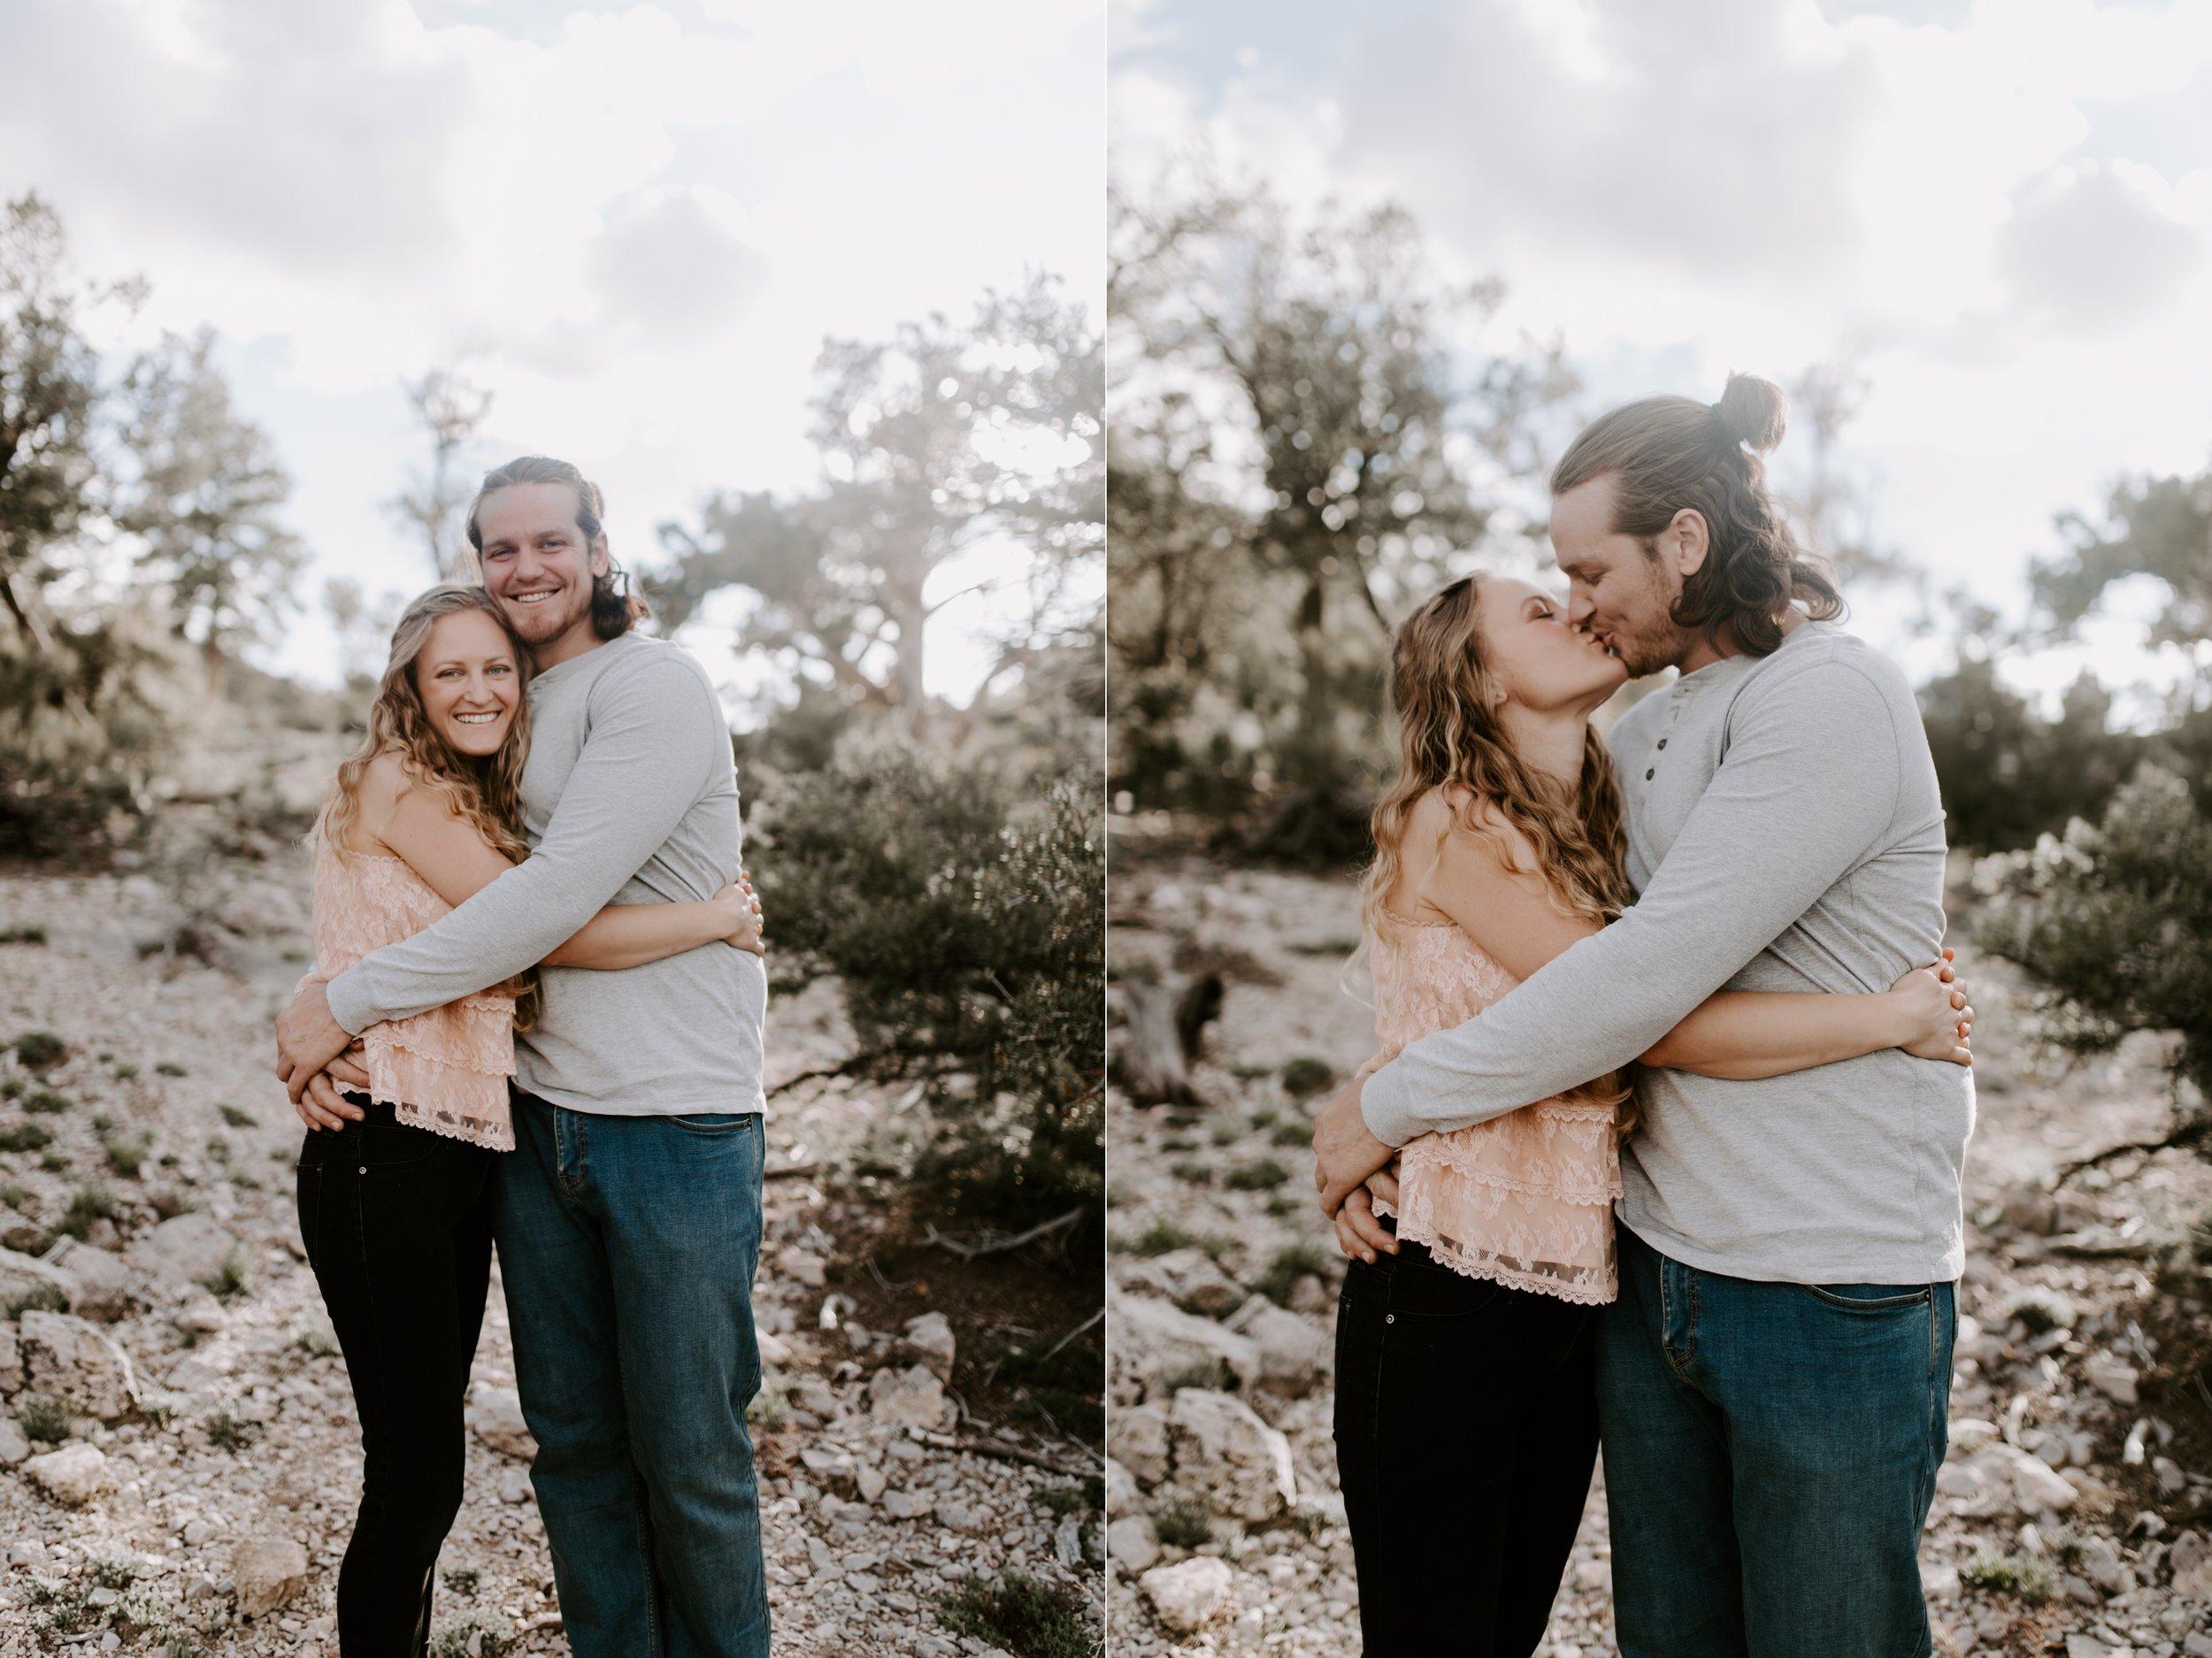 Katelyn Faye Photography | www.katelynfaye.com | Las Vegas Engagement | Mt. Charleston Engagement Session | T&S-2-side.jpg